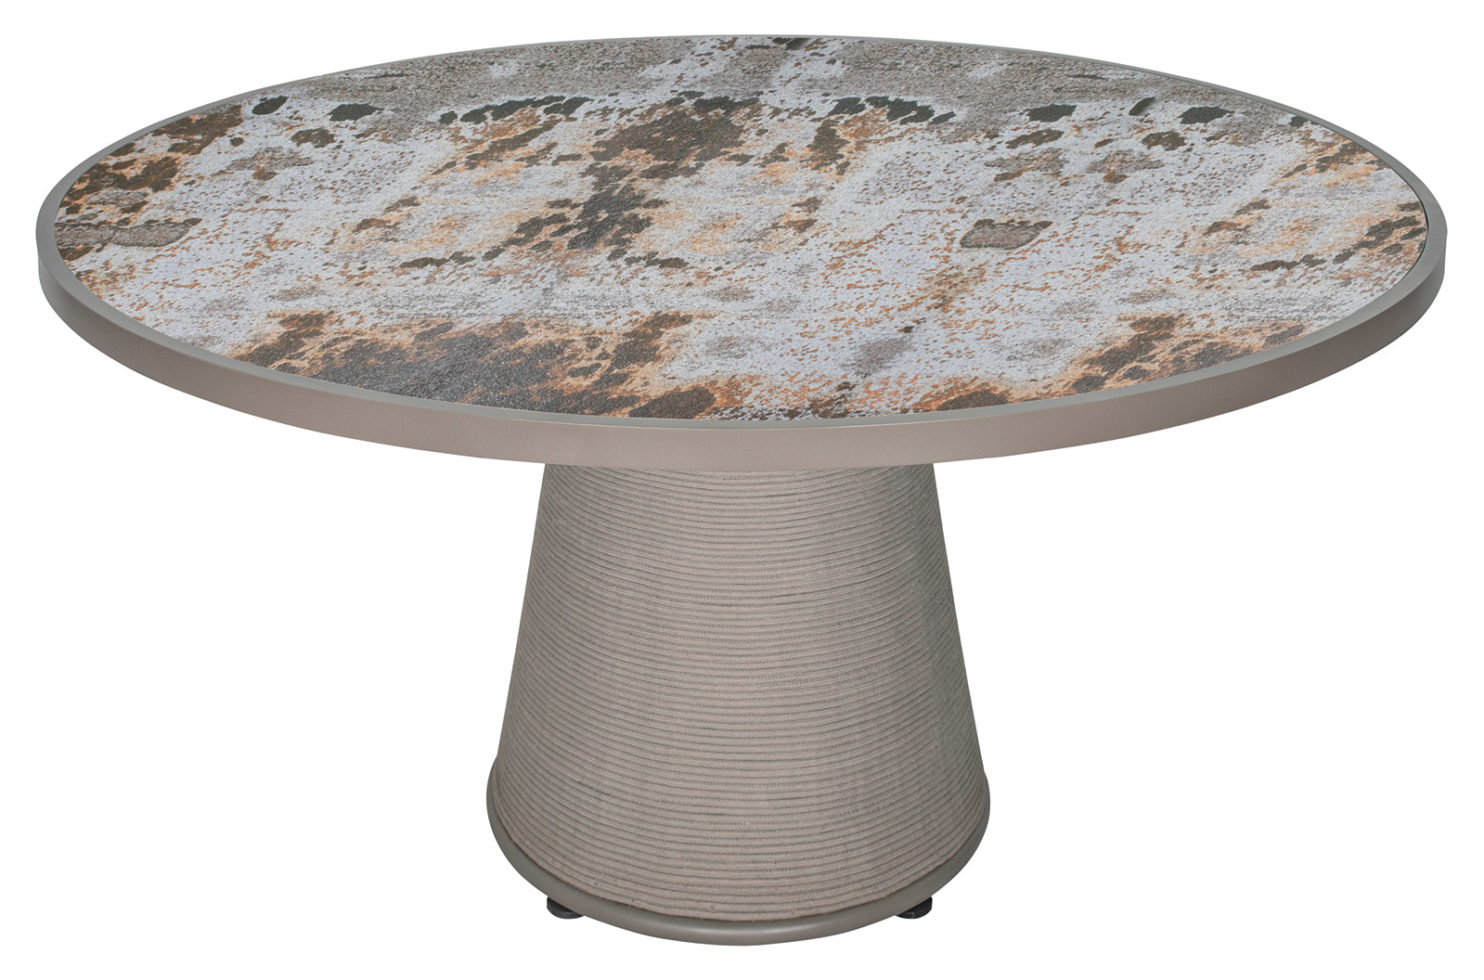 Archipelago alexander table 620FT100P2BBT CWT 1 3Q